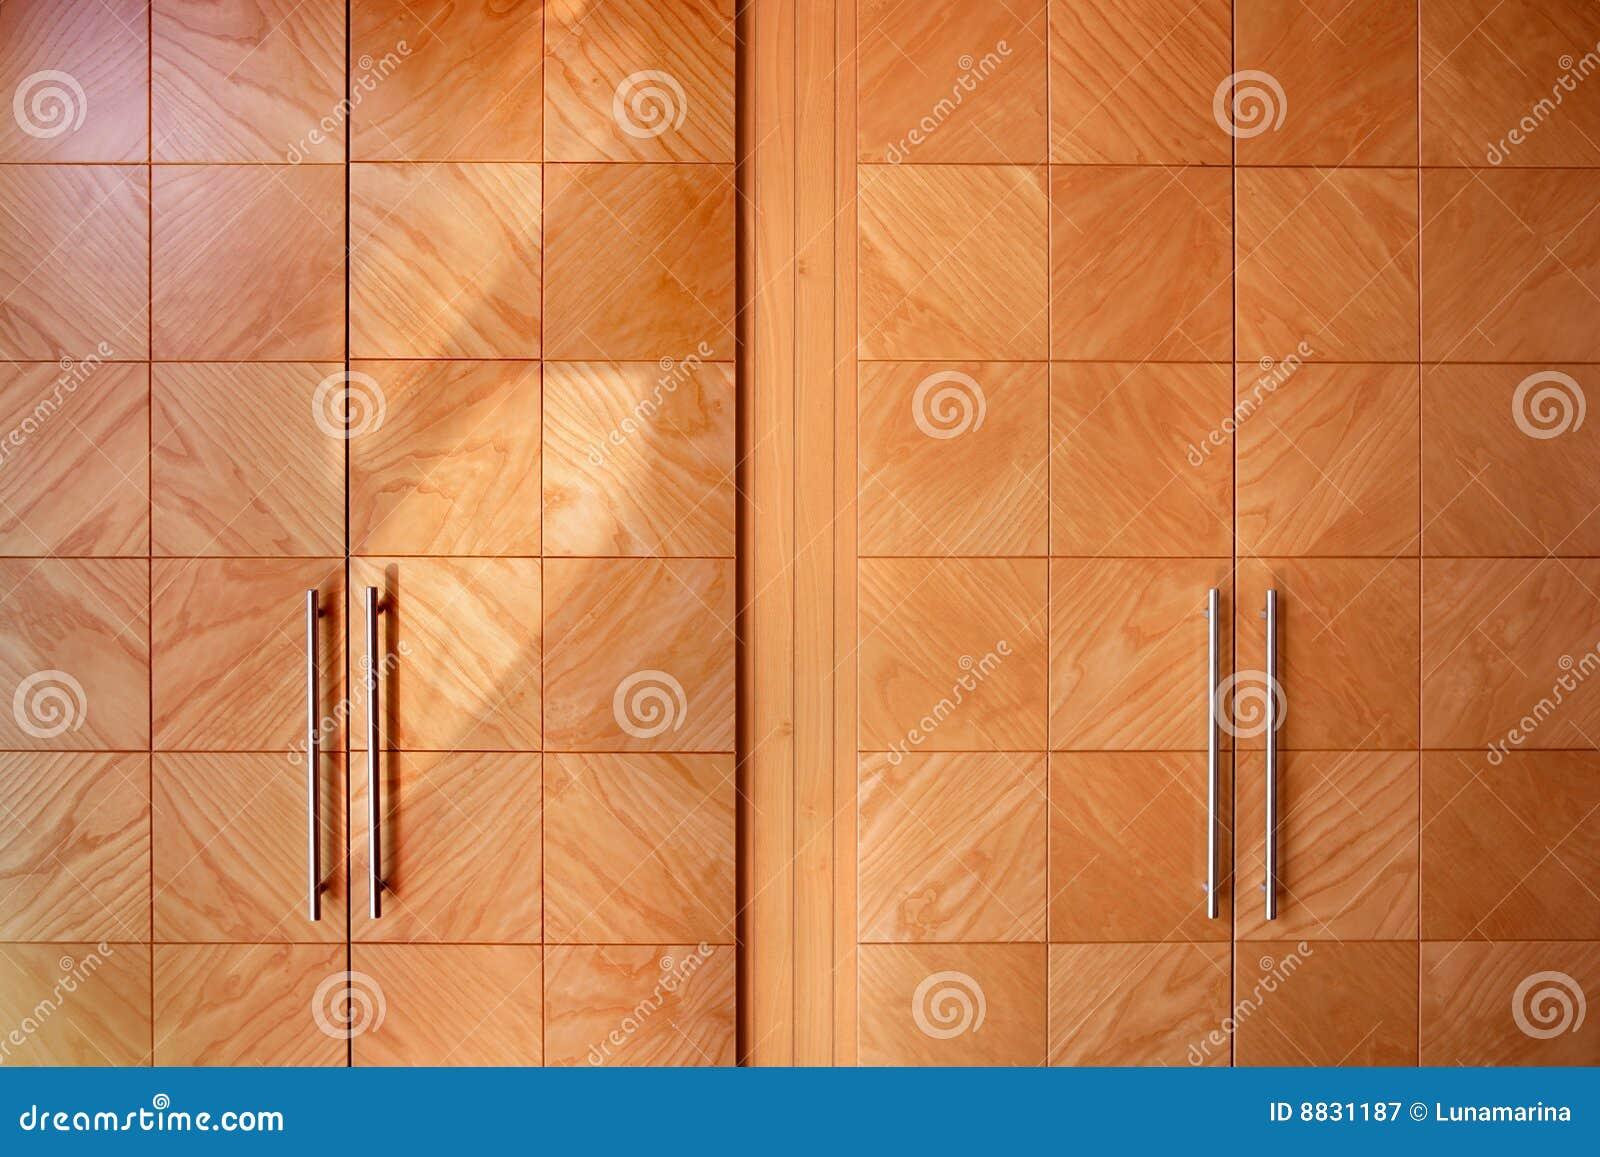 Artesanato Em Mdf Londrina ~ Puertas Modernas De La Naranja Del Armario De La Oficina